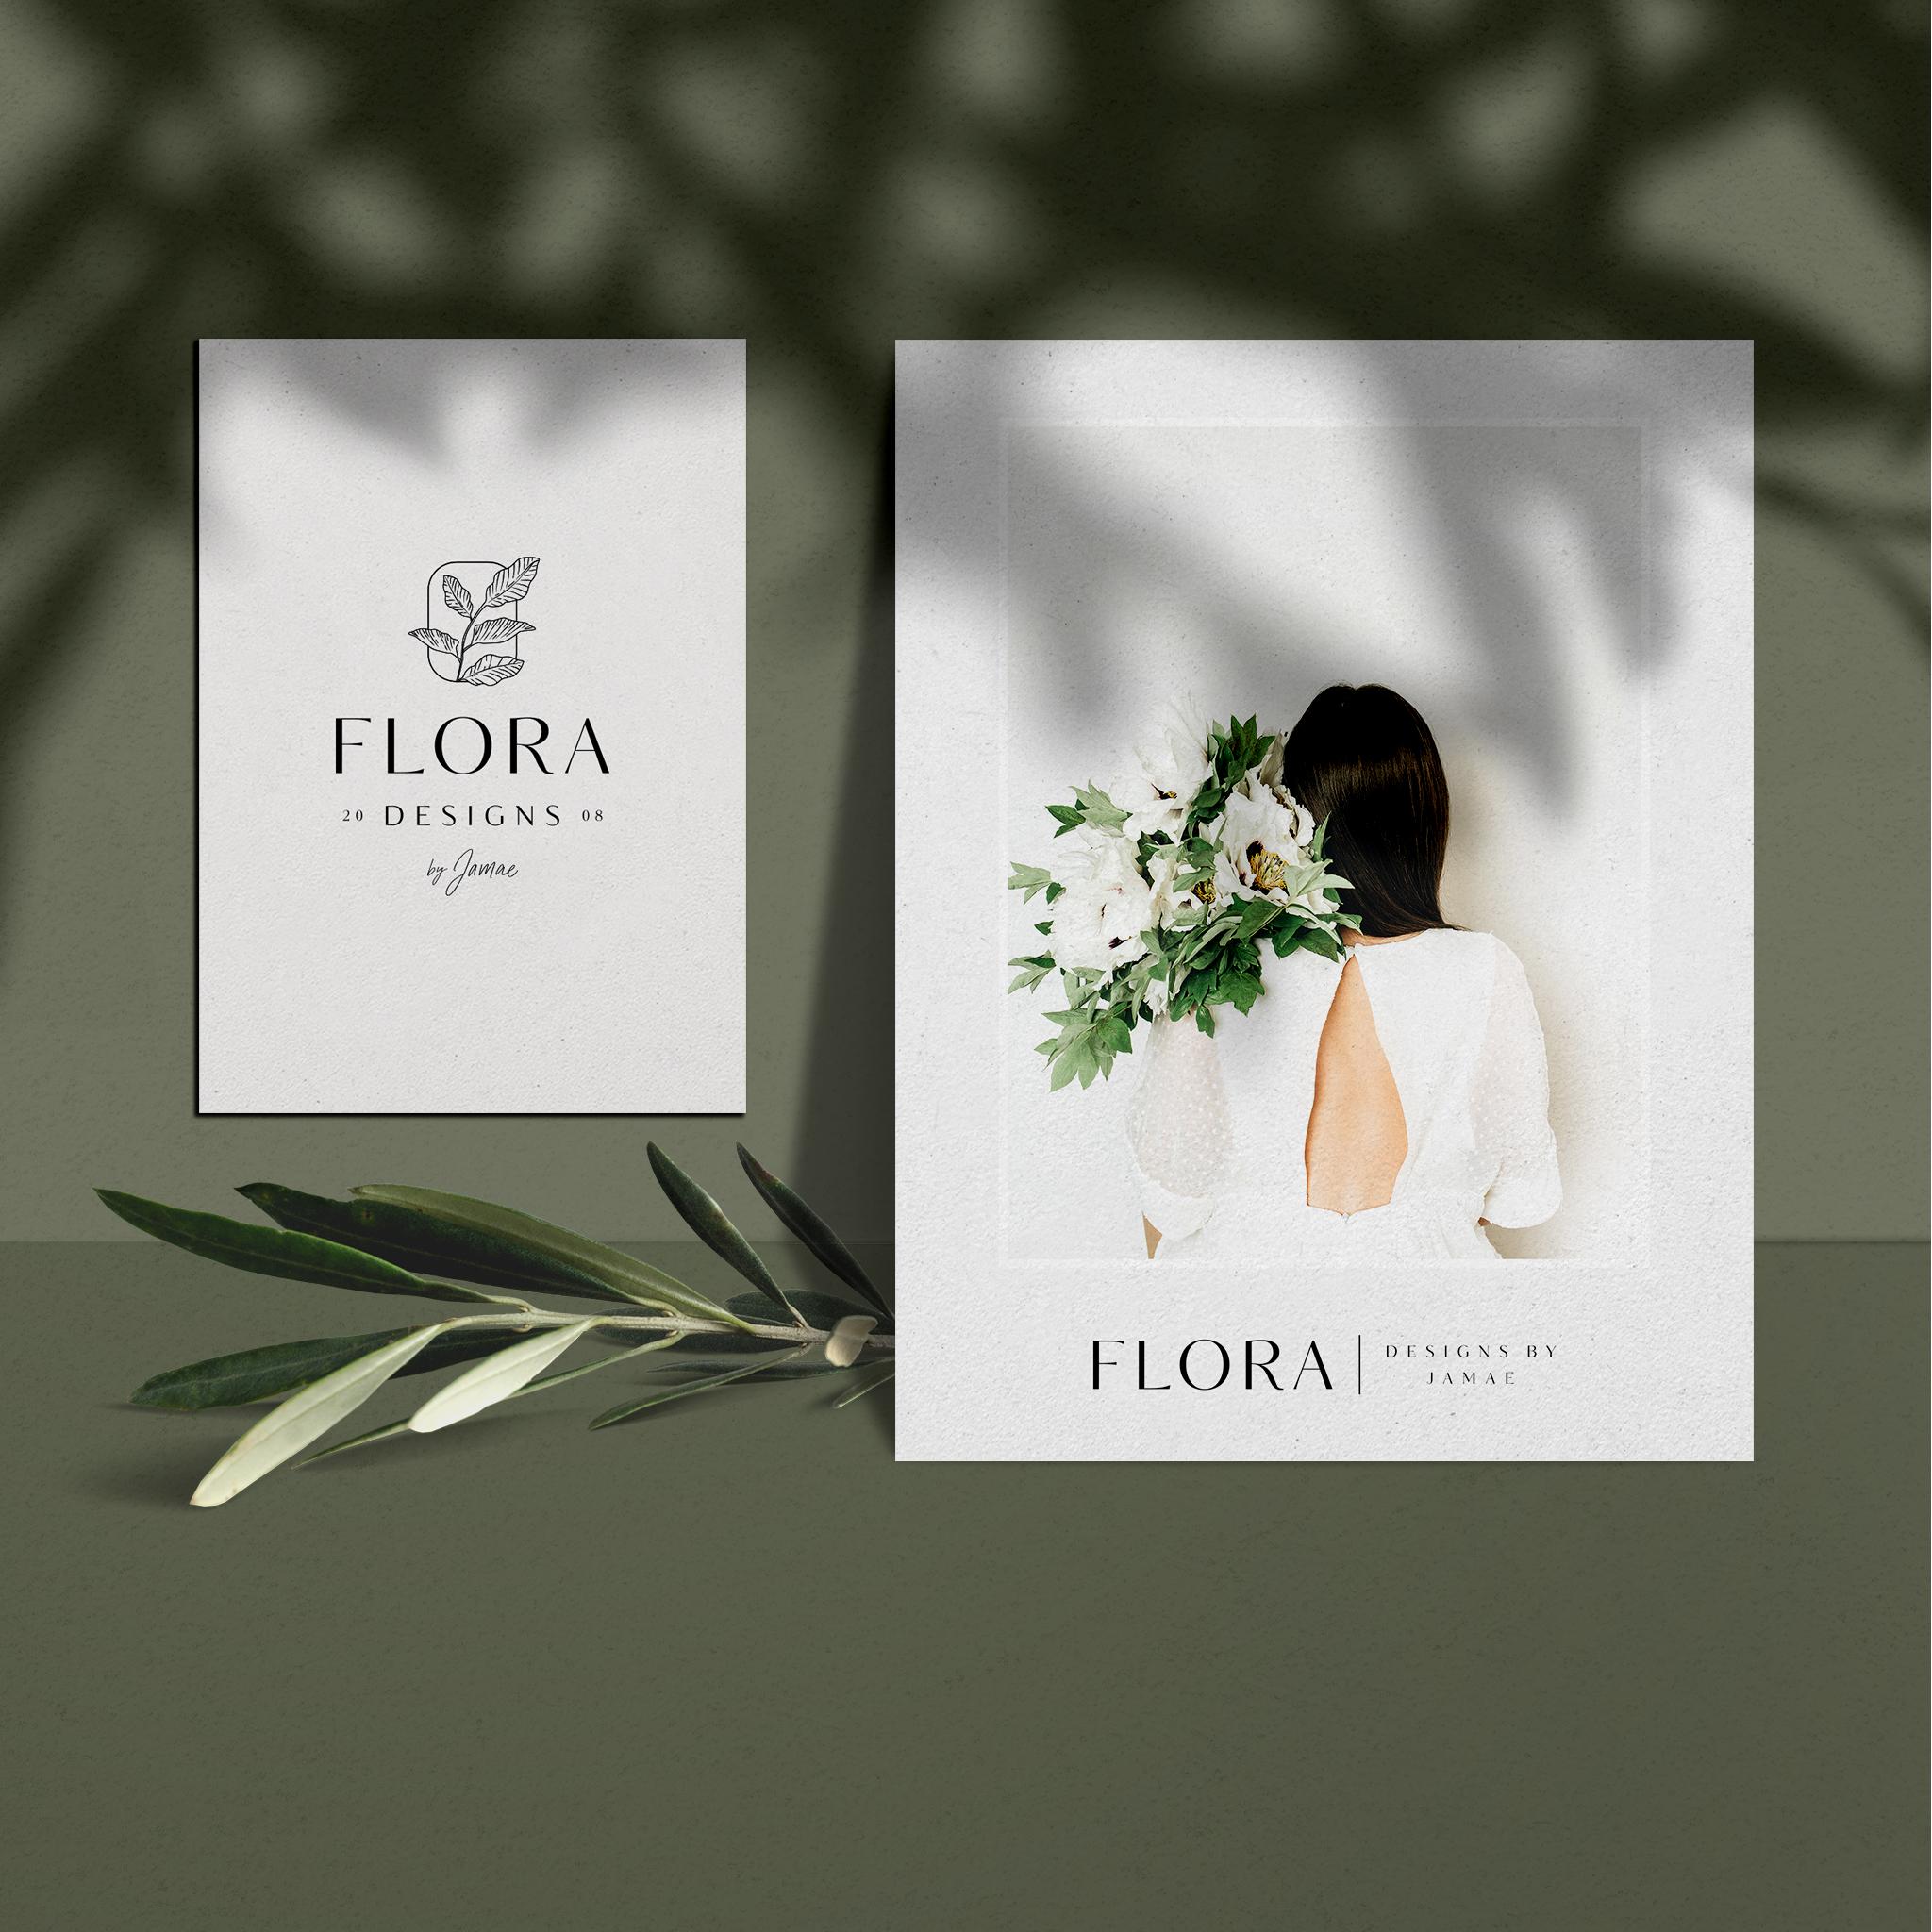 Flora_FB_Image1.jpg